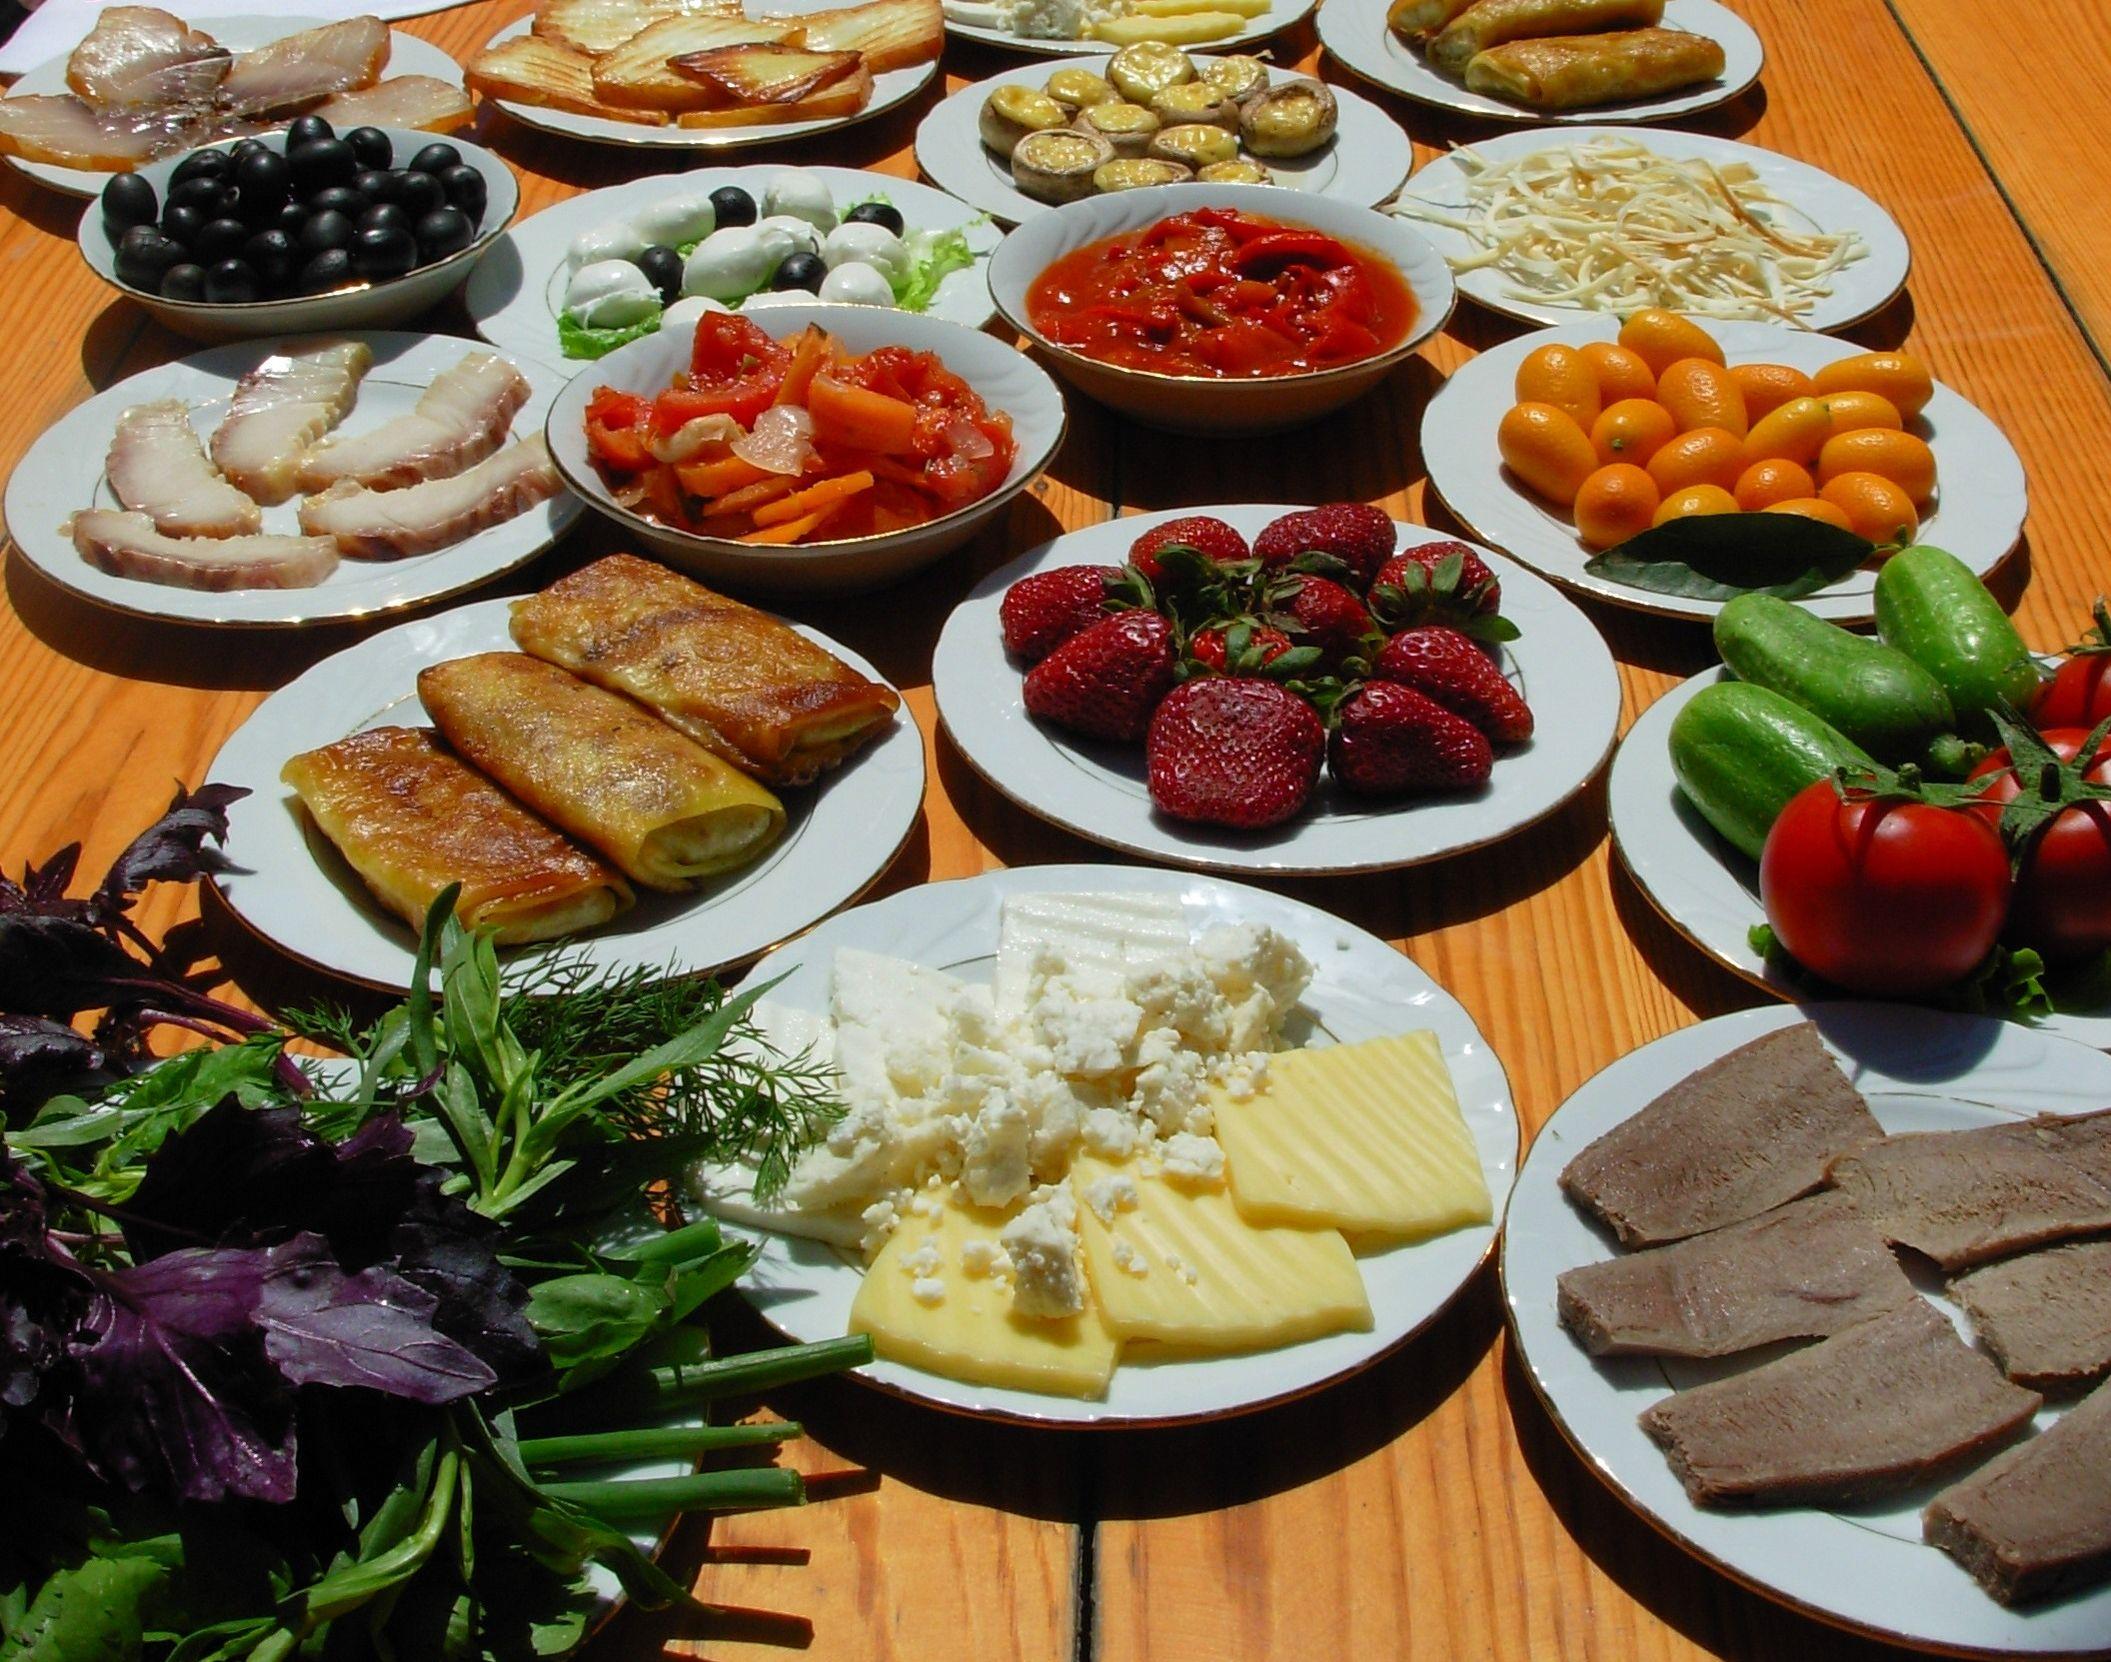 Vladikavkaz, grapes restaurant: oriental cuisine and warm atmosphere 64